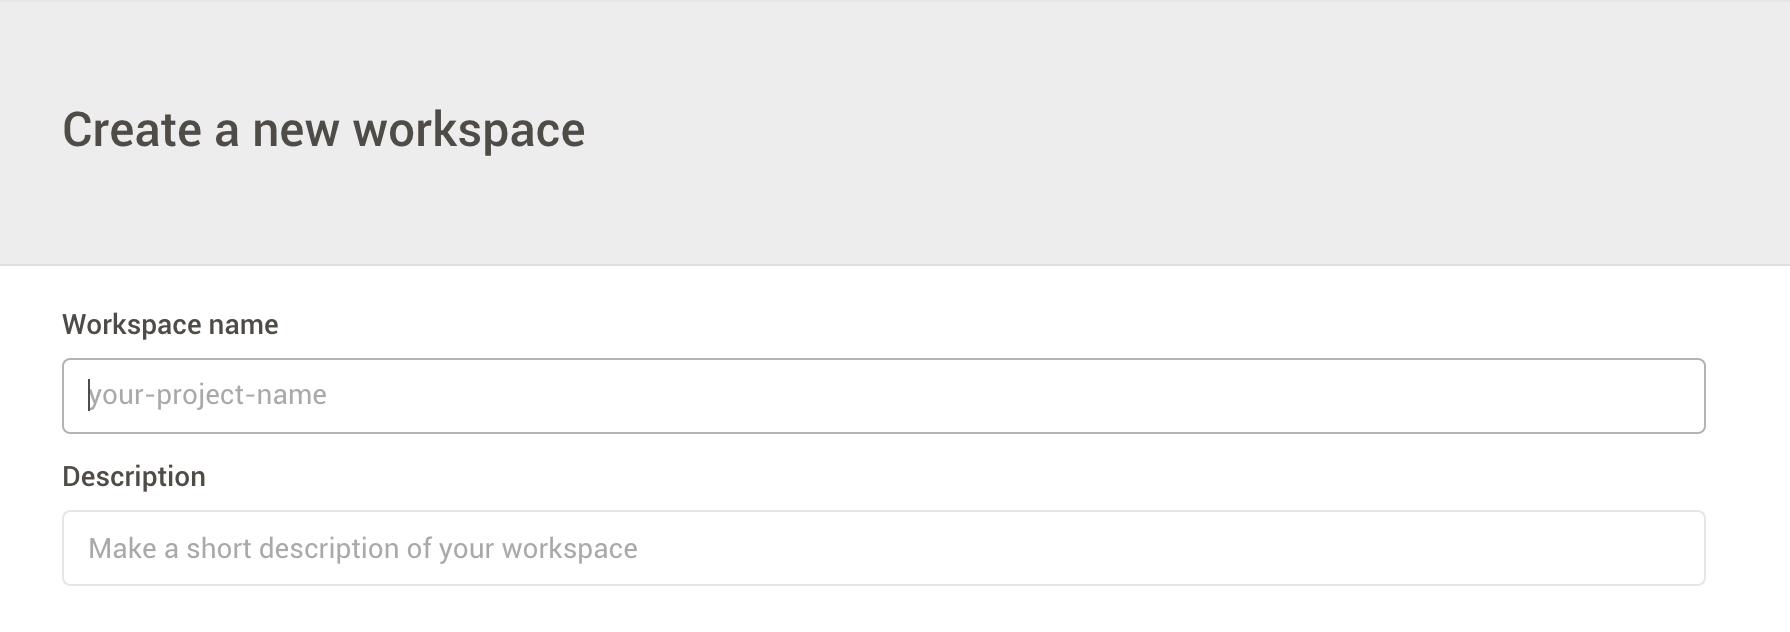 Setting Up an SSH Workspace · Cloud9